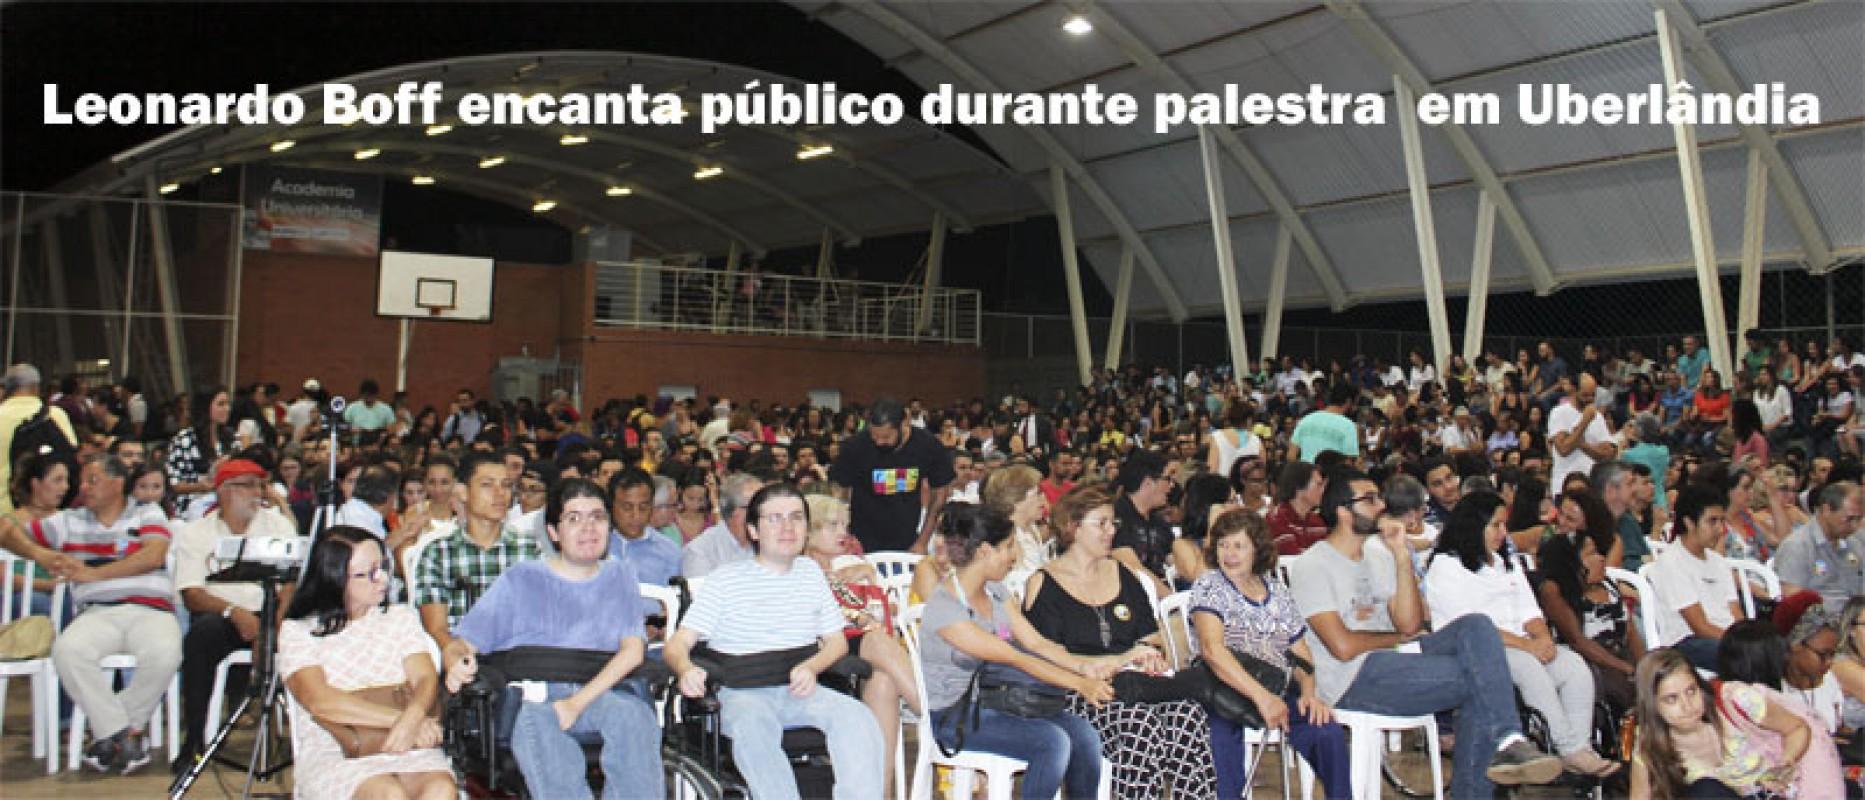 Leonardo Boff encanta público durante palestra  em Uberlândia